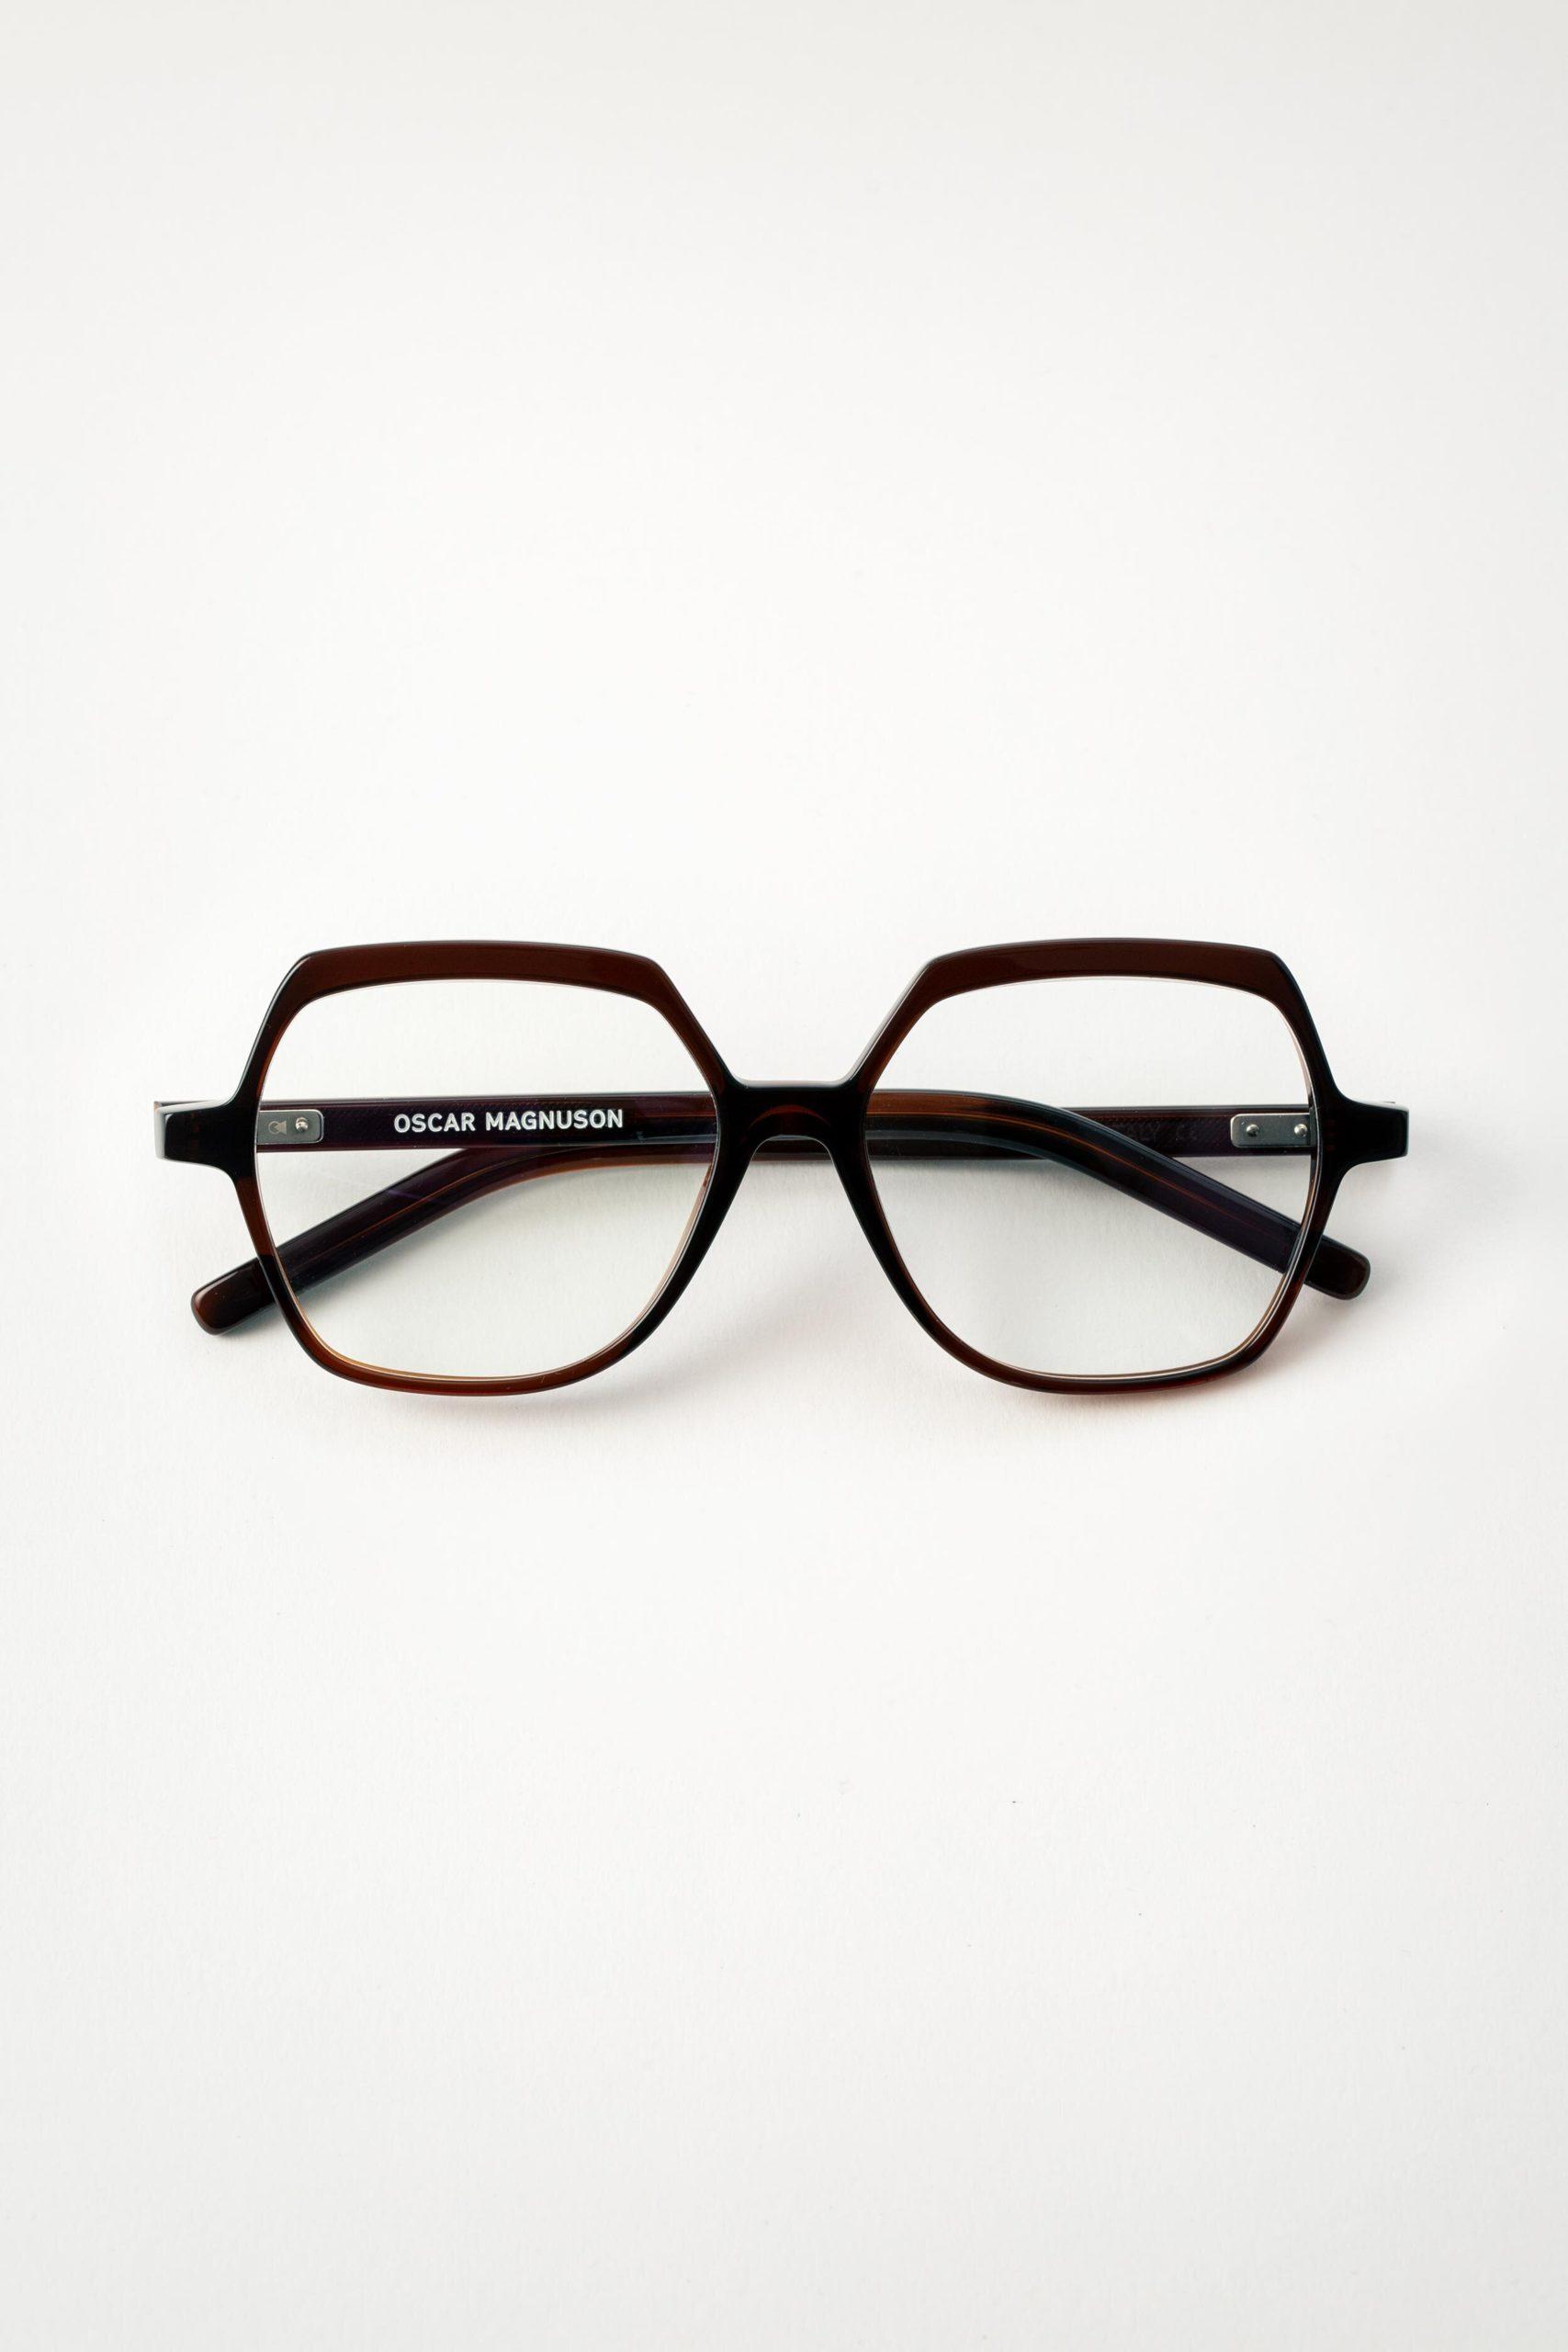 lunette oscar magnuson bio-acetate brun foncé chez Leneta